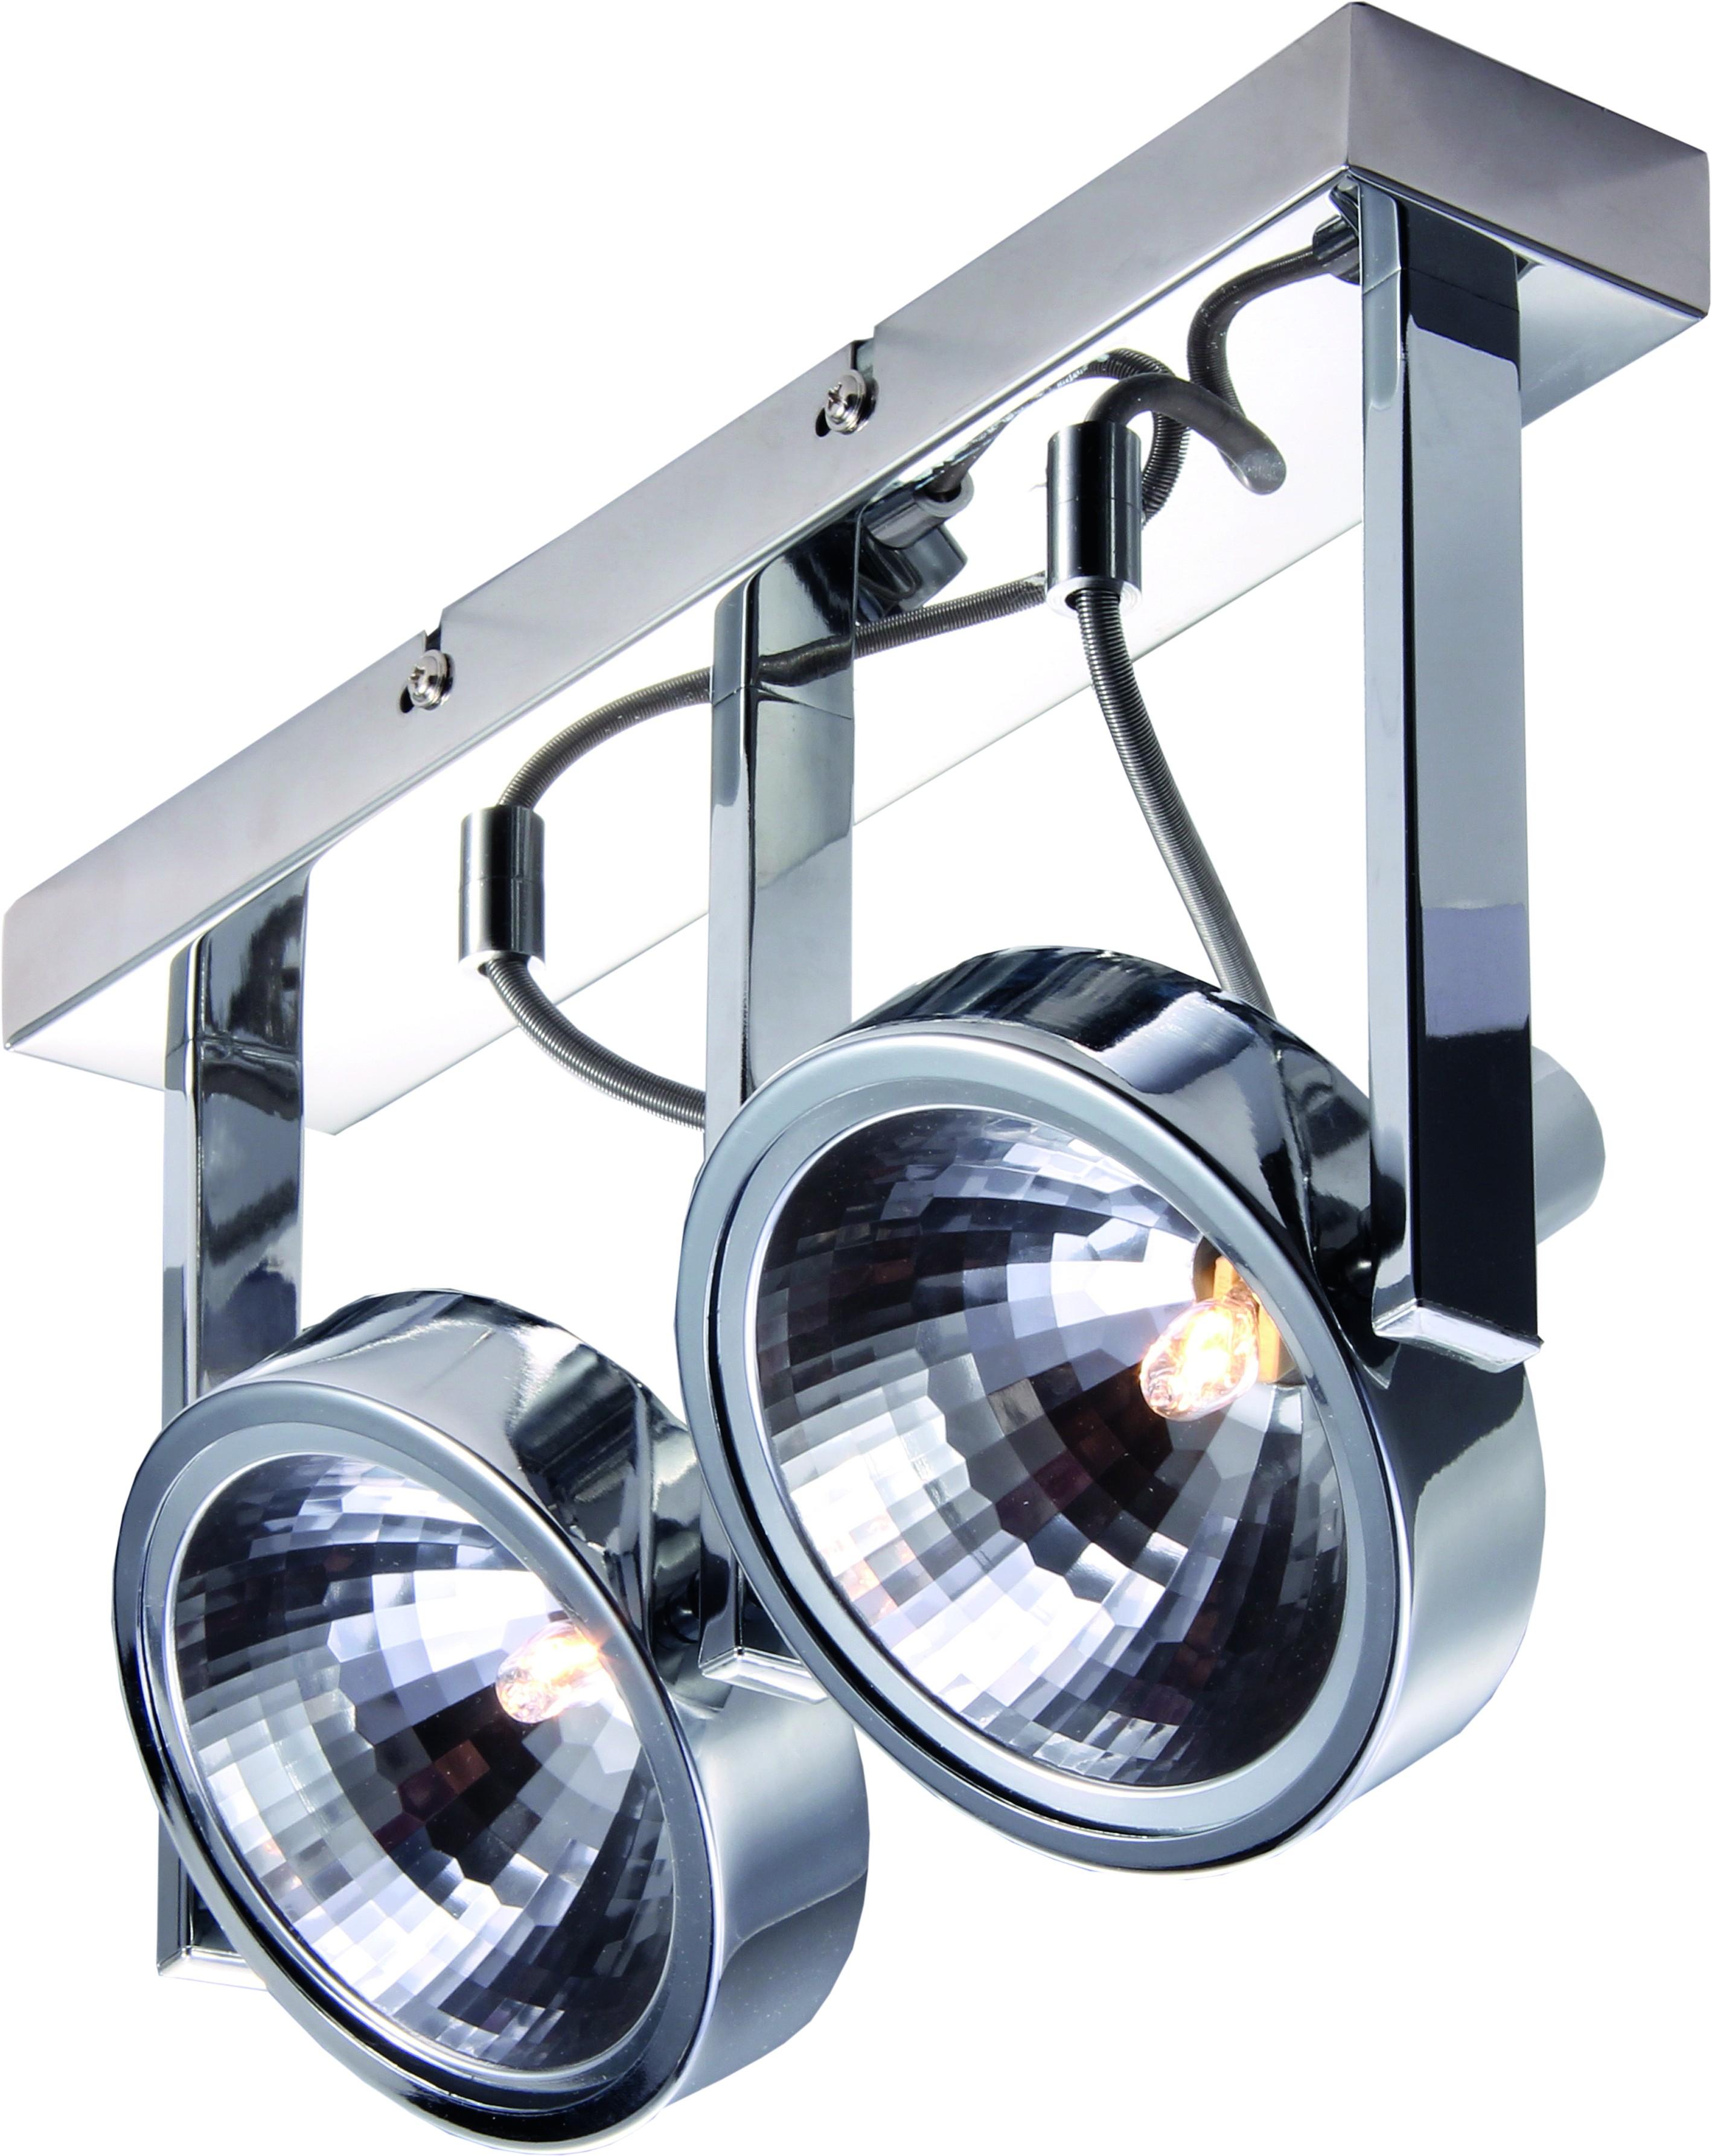 Спот Arte lamp A4507pl-2cc светильник на штанге arte lamp faccia a4507pl 2cc